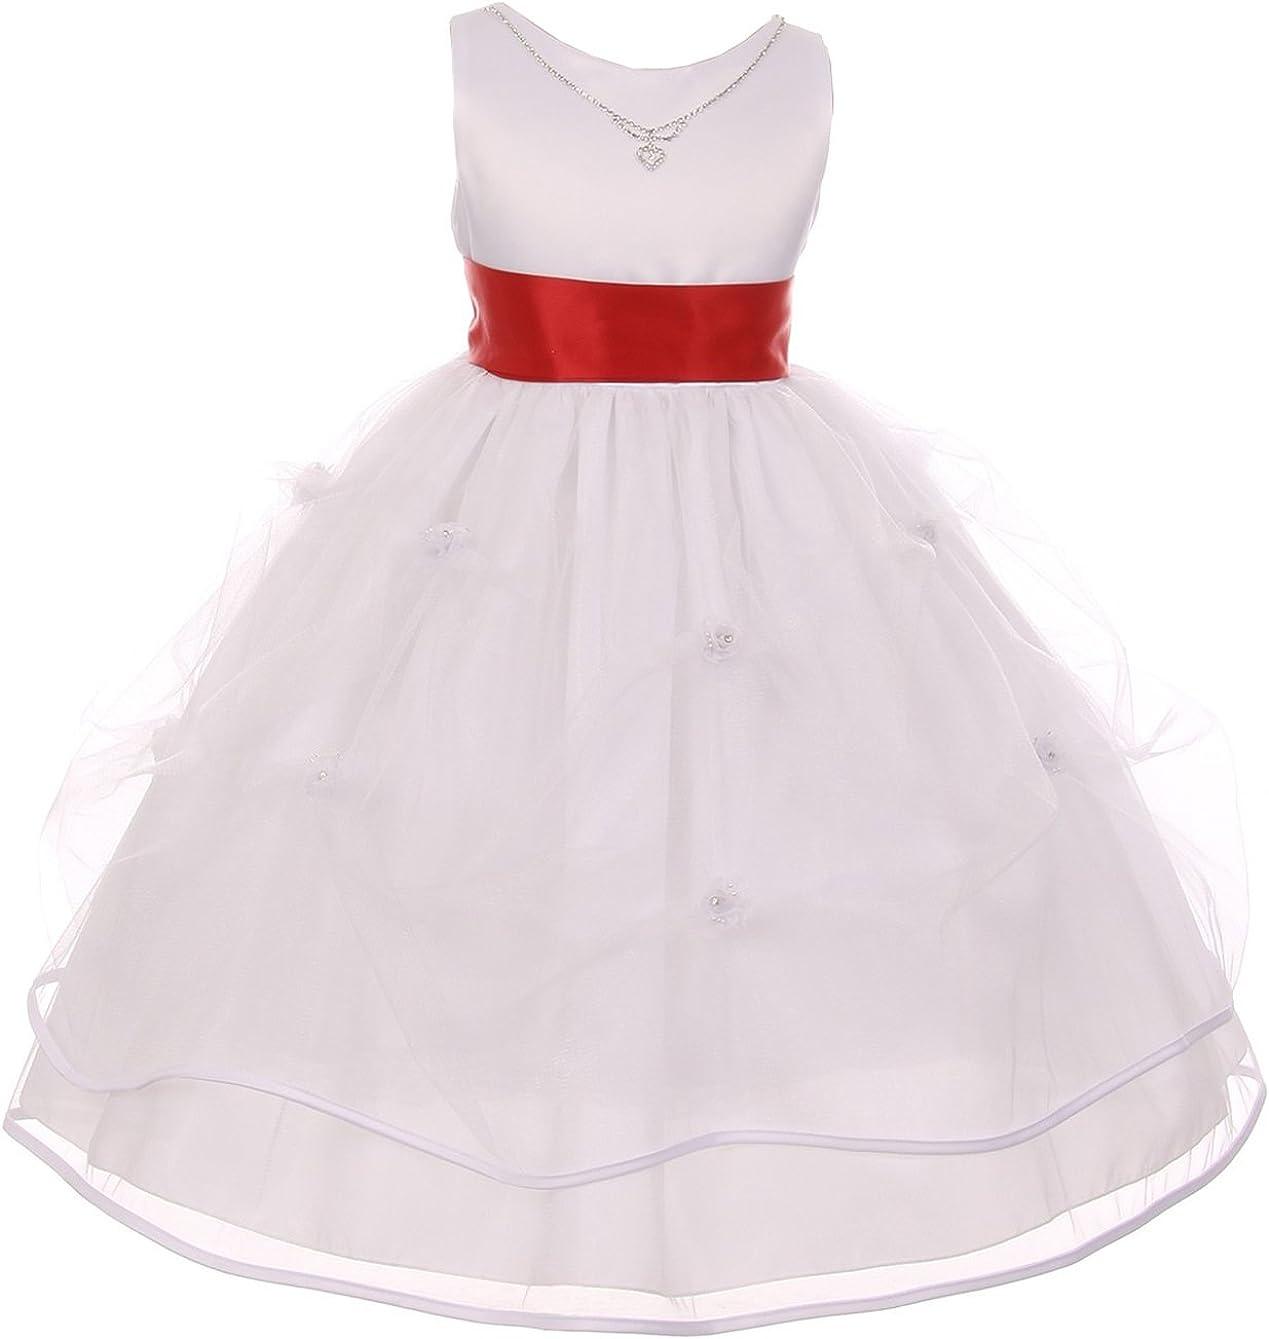 Dreamer Sleeveless Crystal Necklace Tulle Pageant Communion Flower Girl Dress